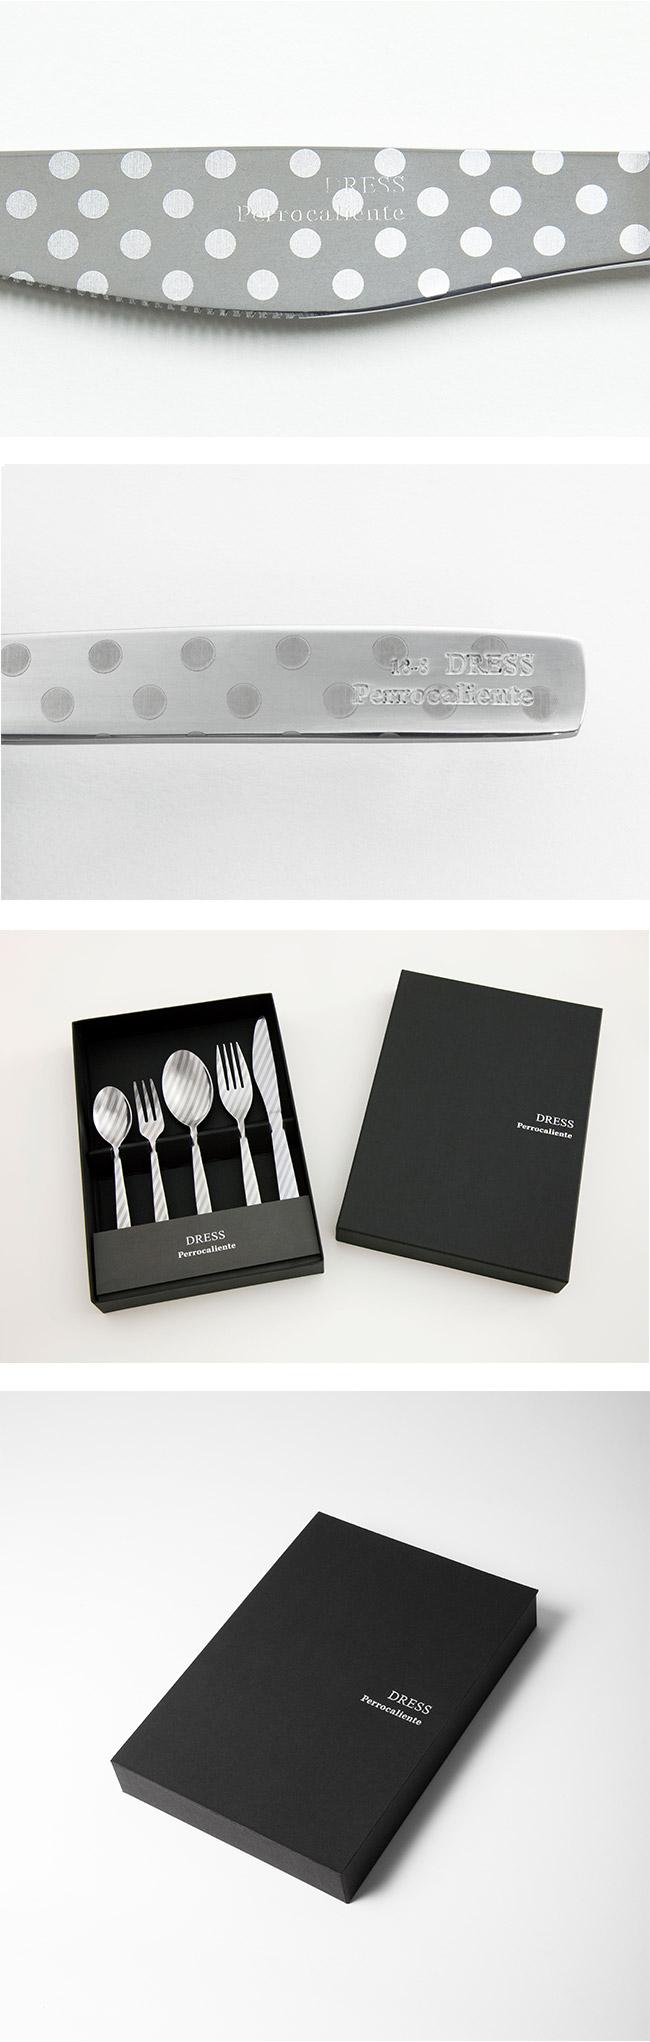 Perrocaliente Dress Gift Set 銀色盒裝餐具組 兩對組 波卡圓點 (湯匙*2+叉子*2)